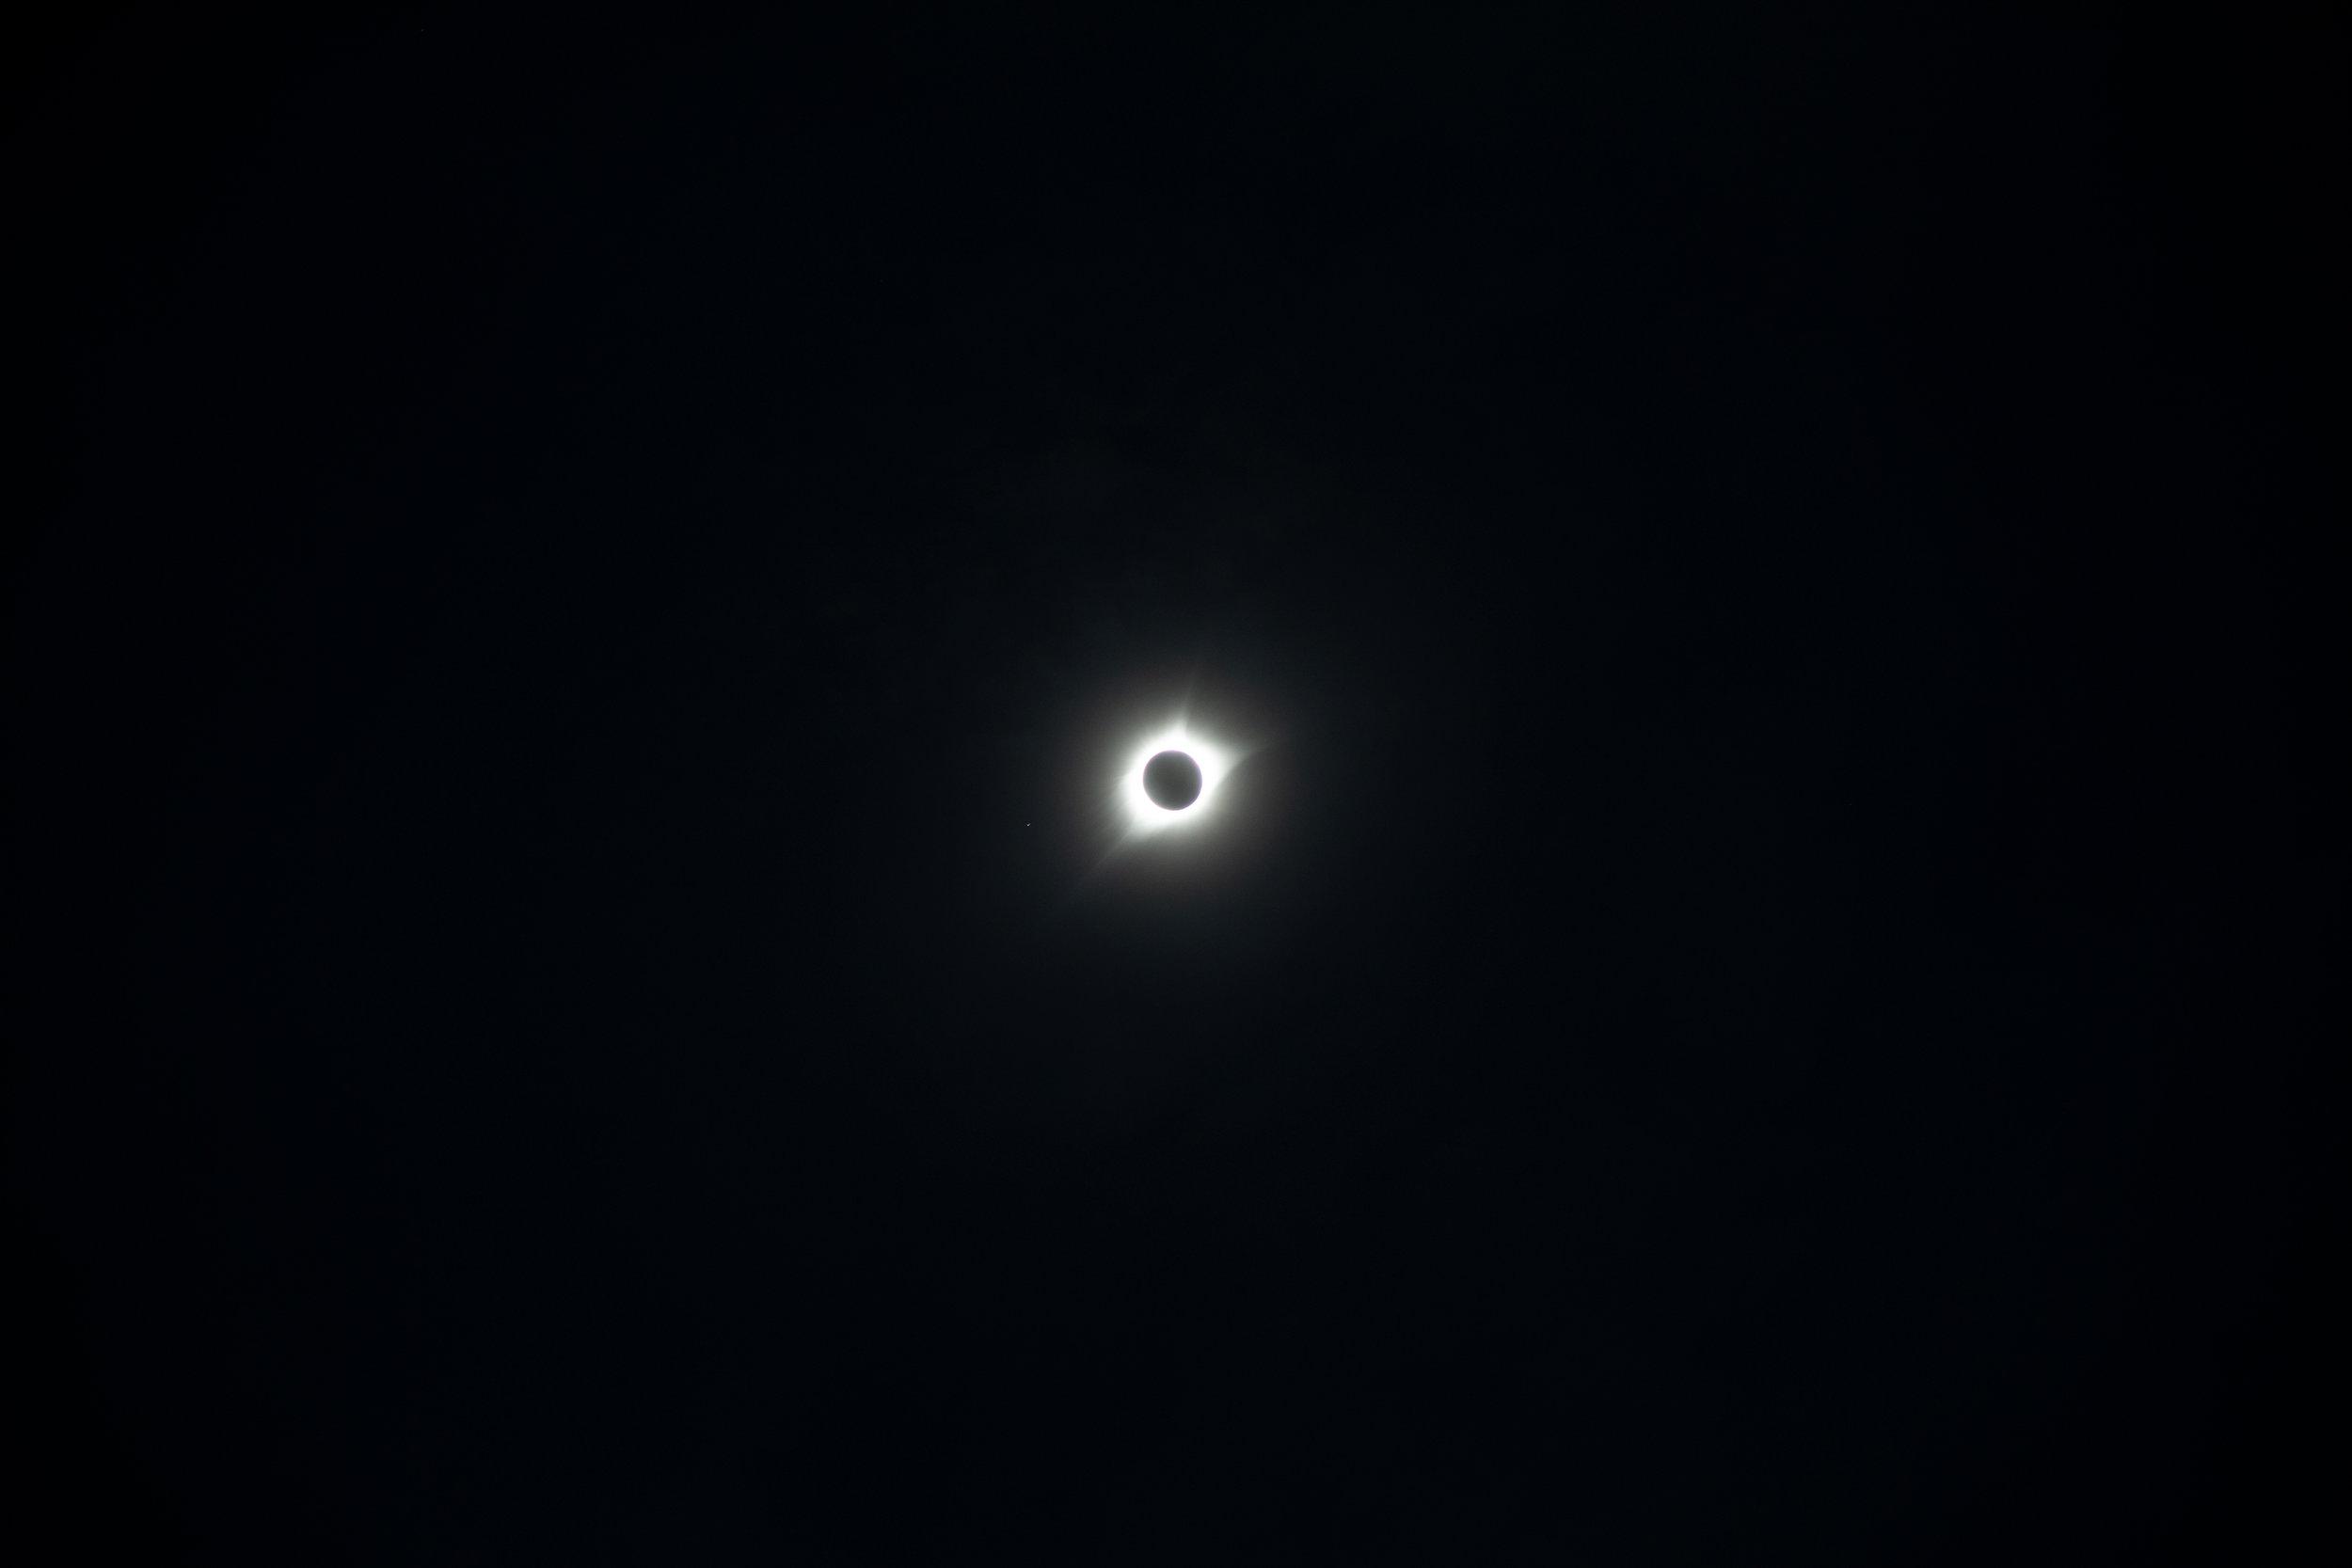 black_hole_sun.jpg